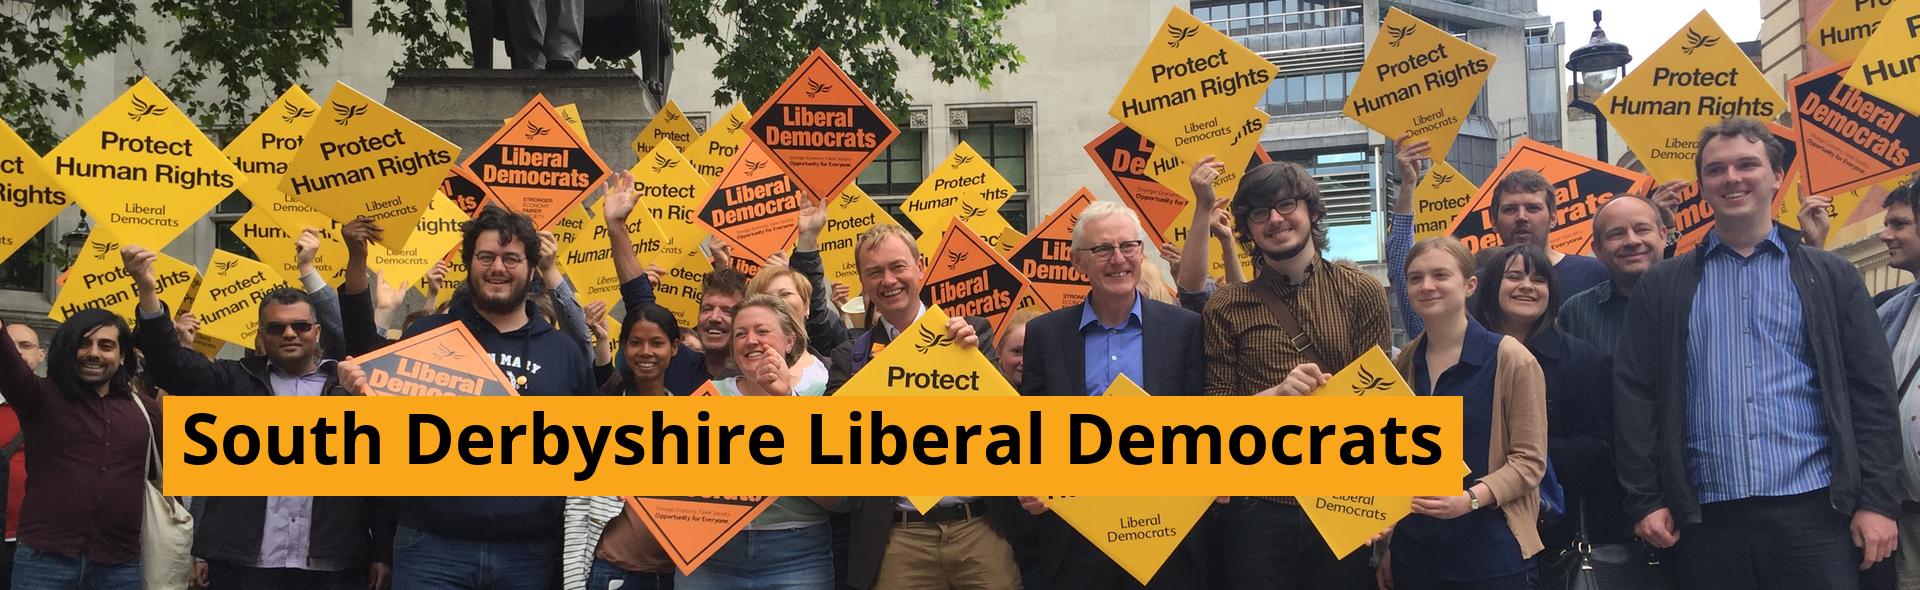 South Derbyshire Liberal Democrats